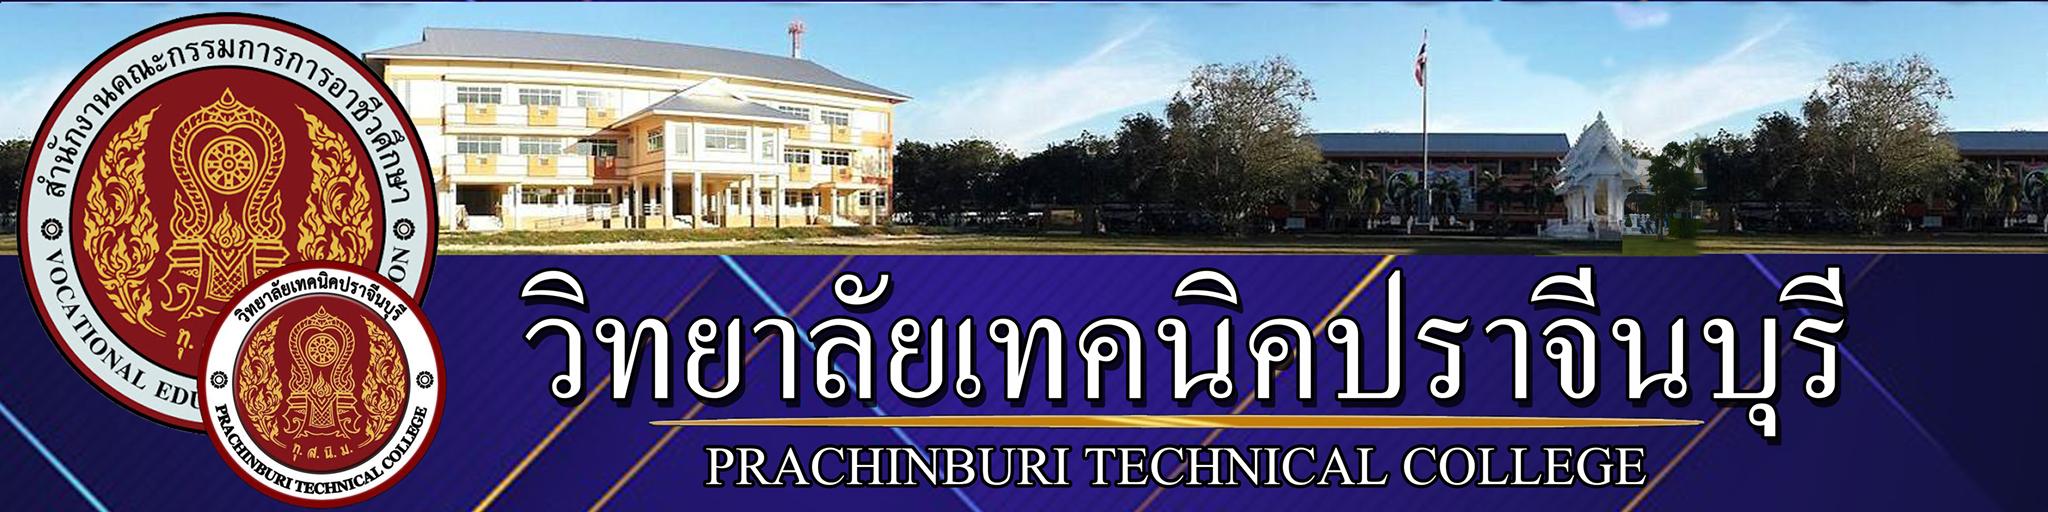 <p Prachinburi Technical Collage hidden><p hidden>